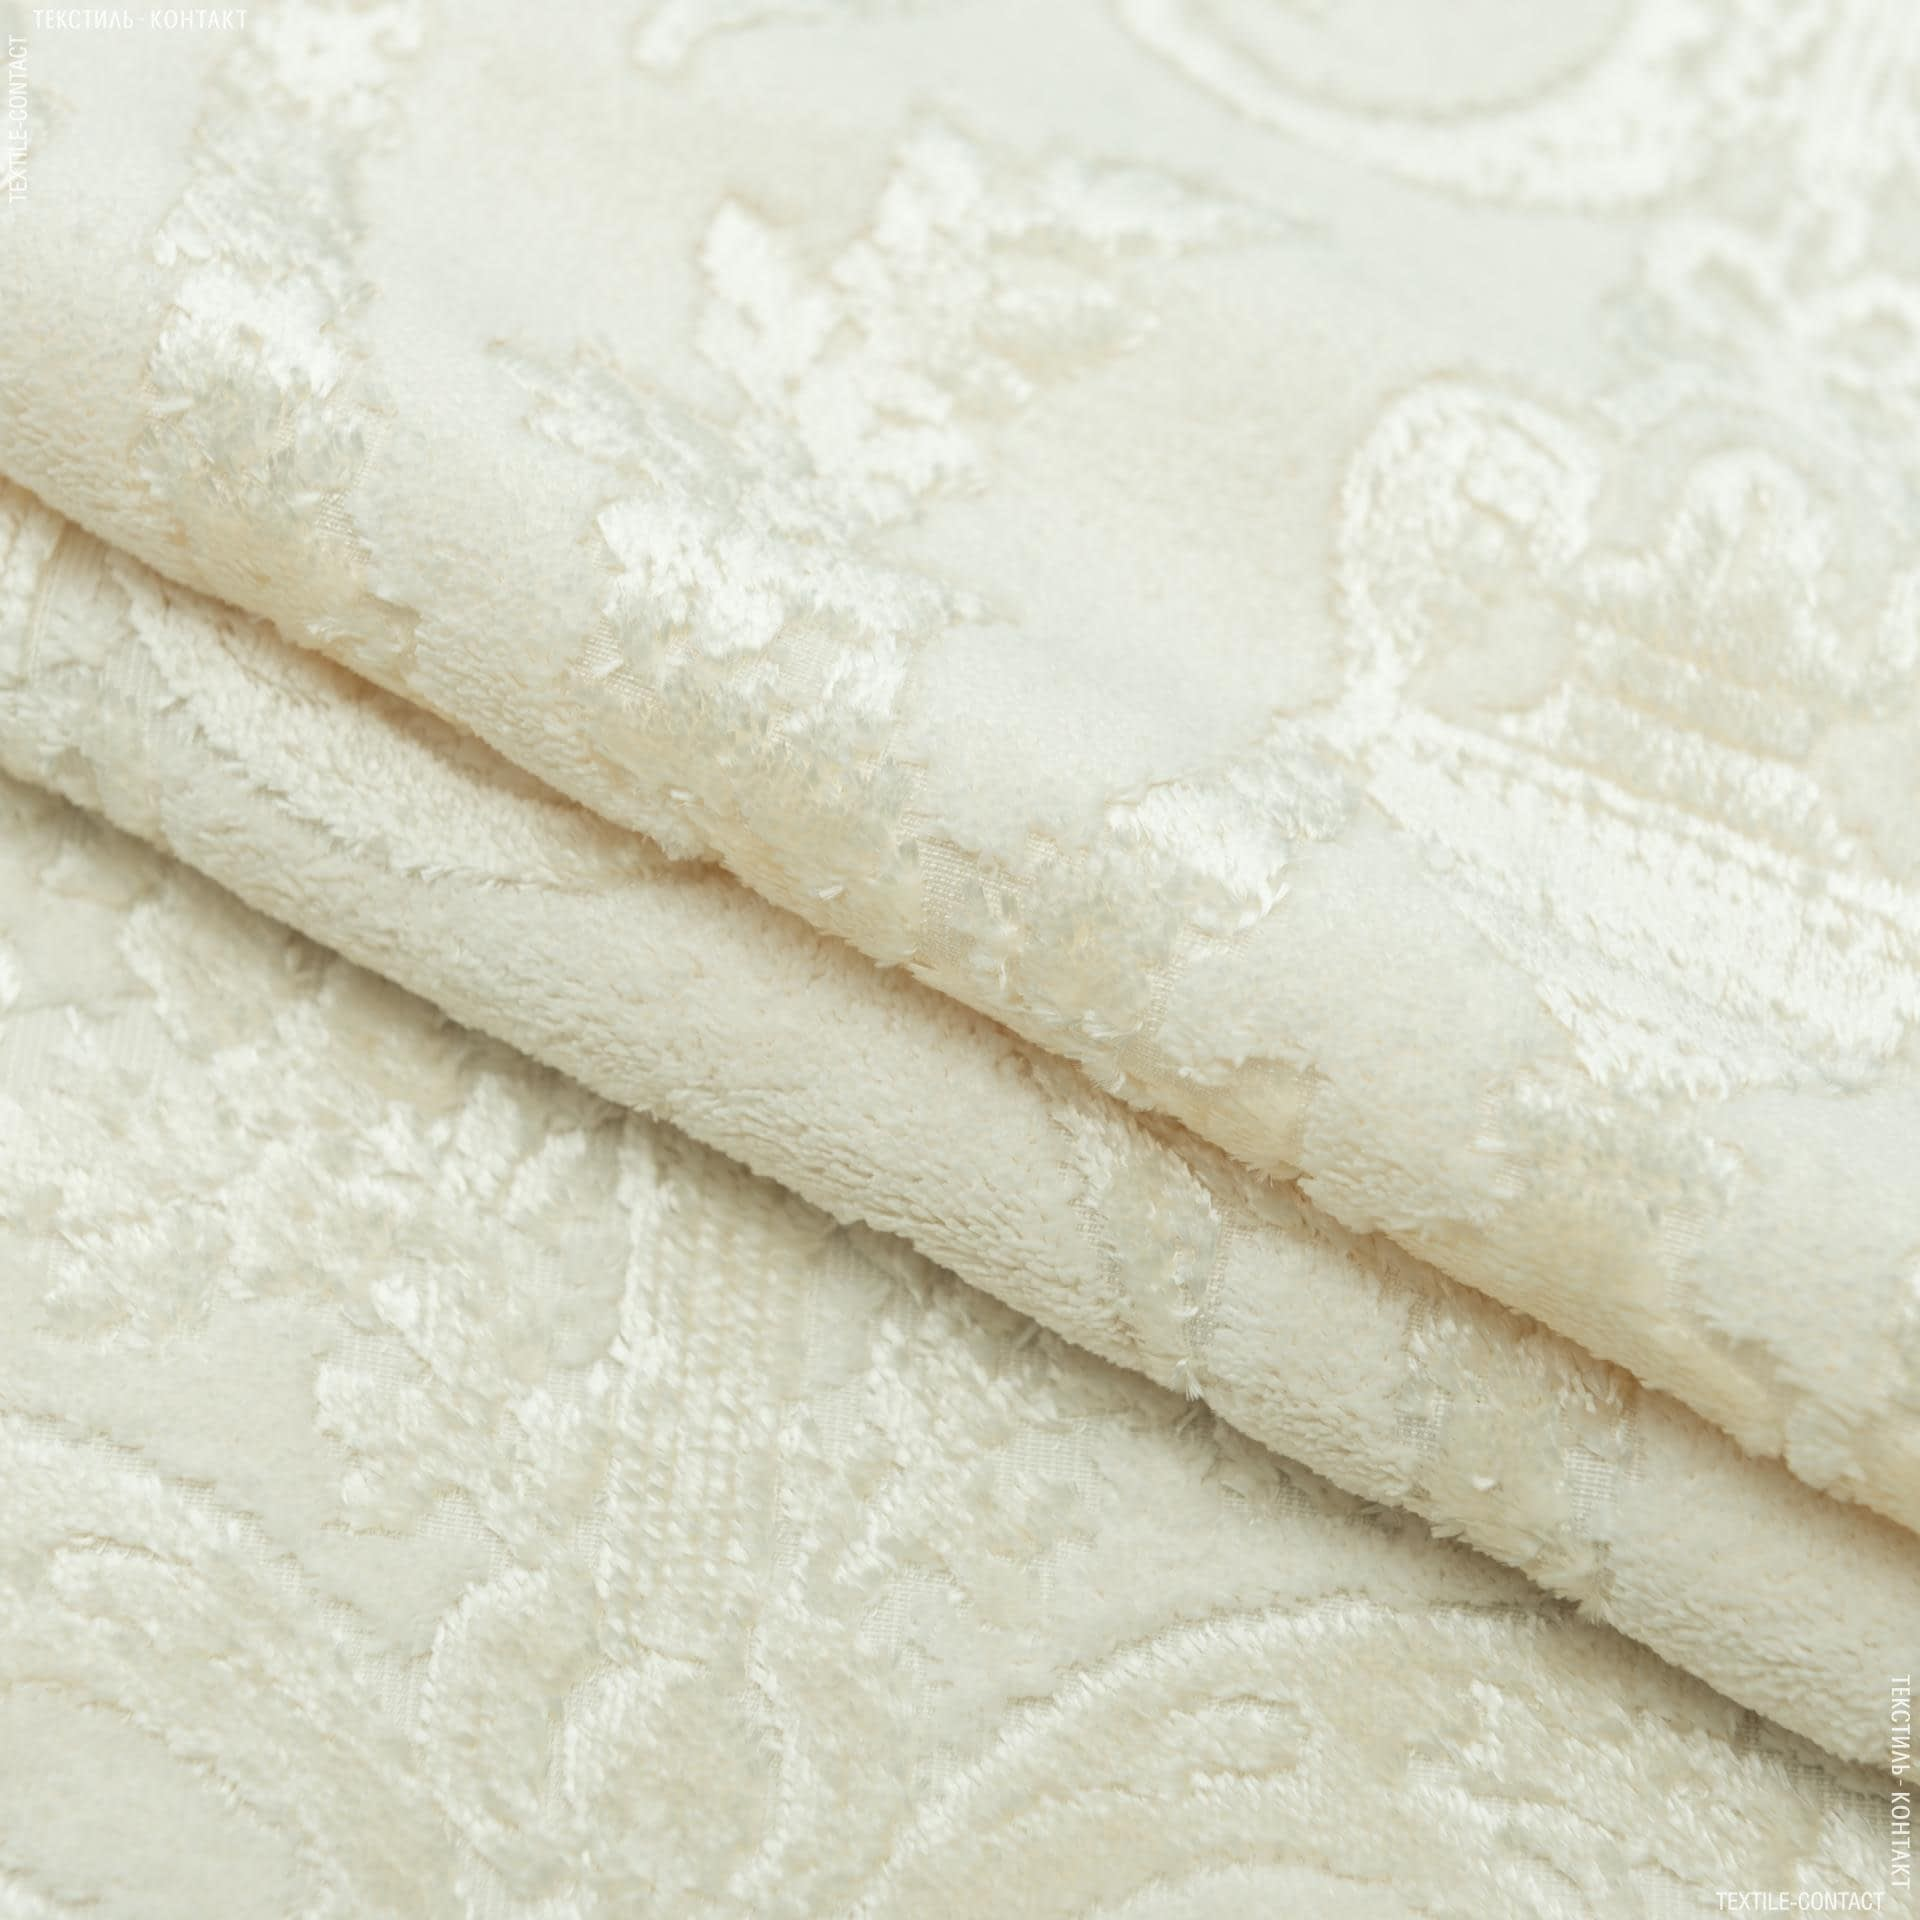 Ткани для мебели - Велюр   Дарая/Версаль  крем-брюле  (аналог 154720)